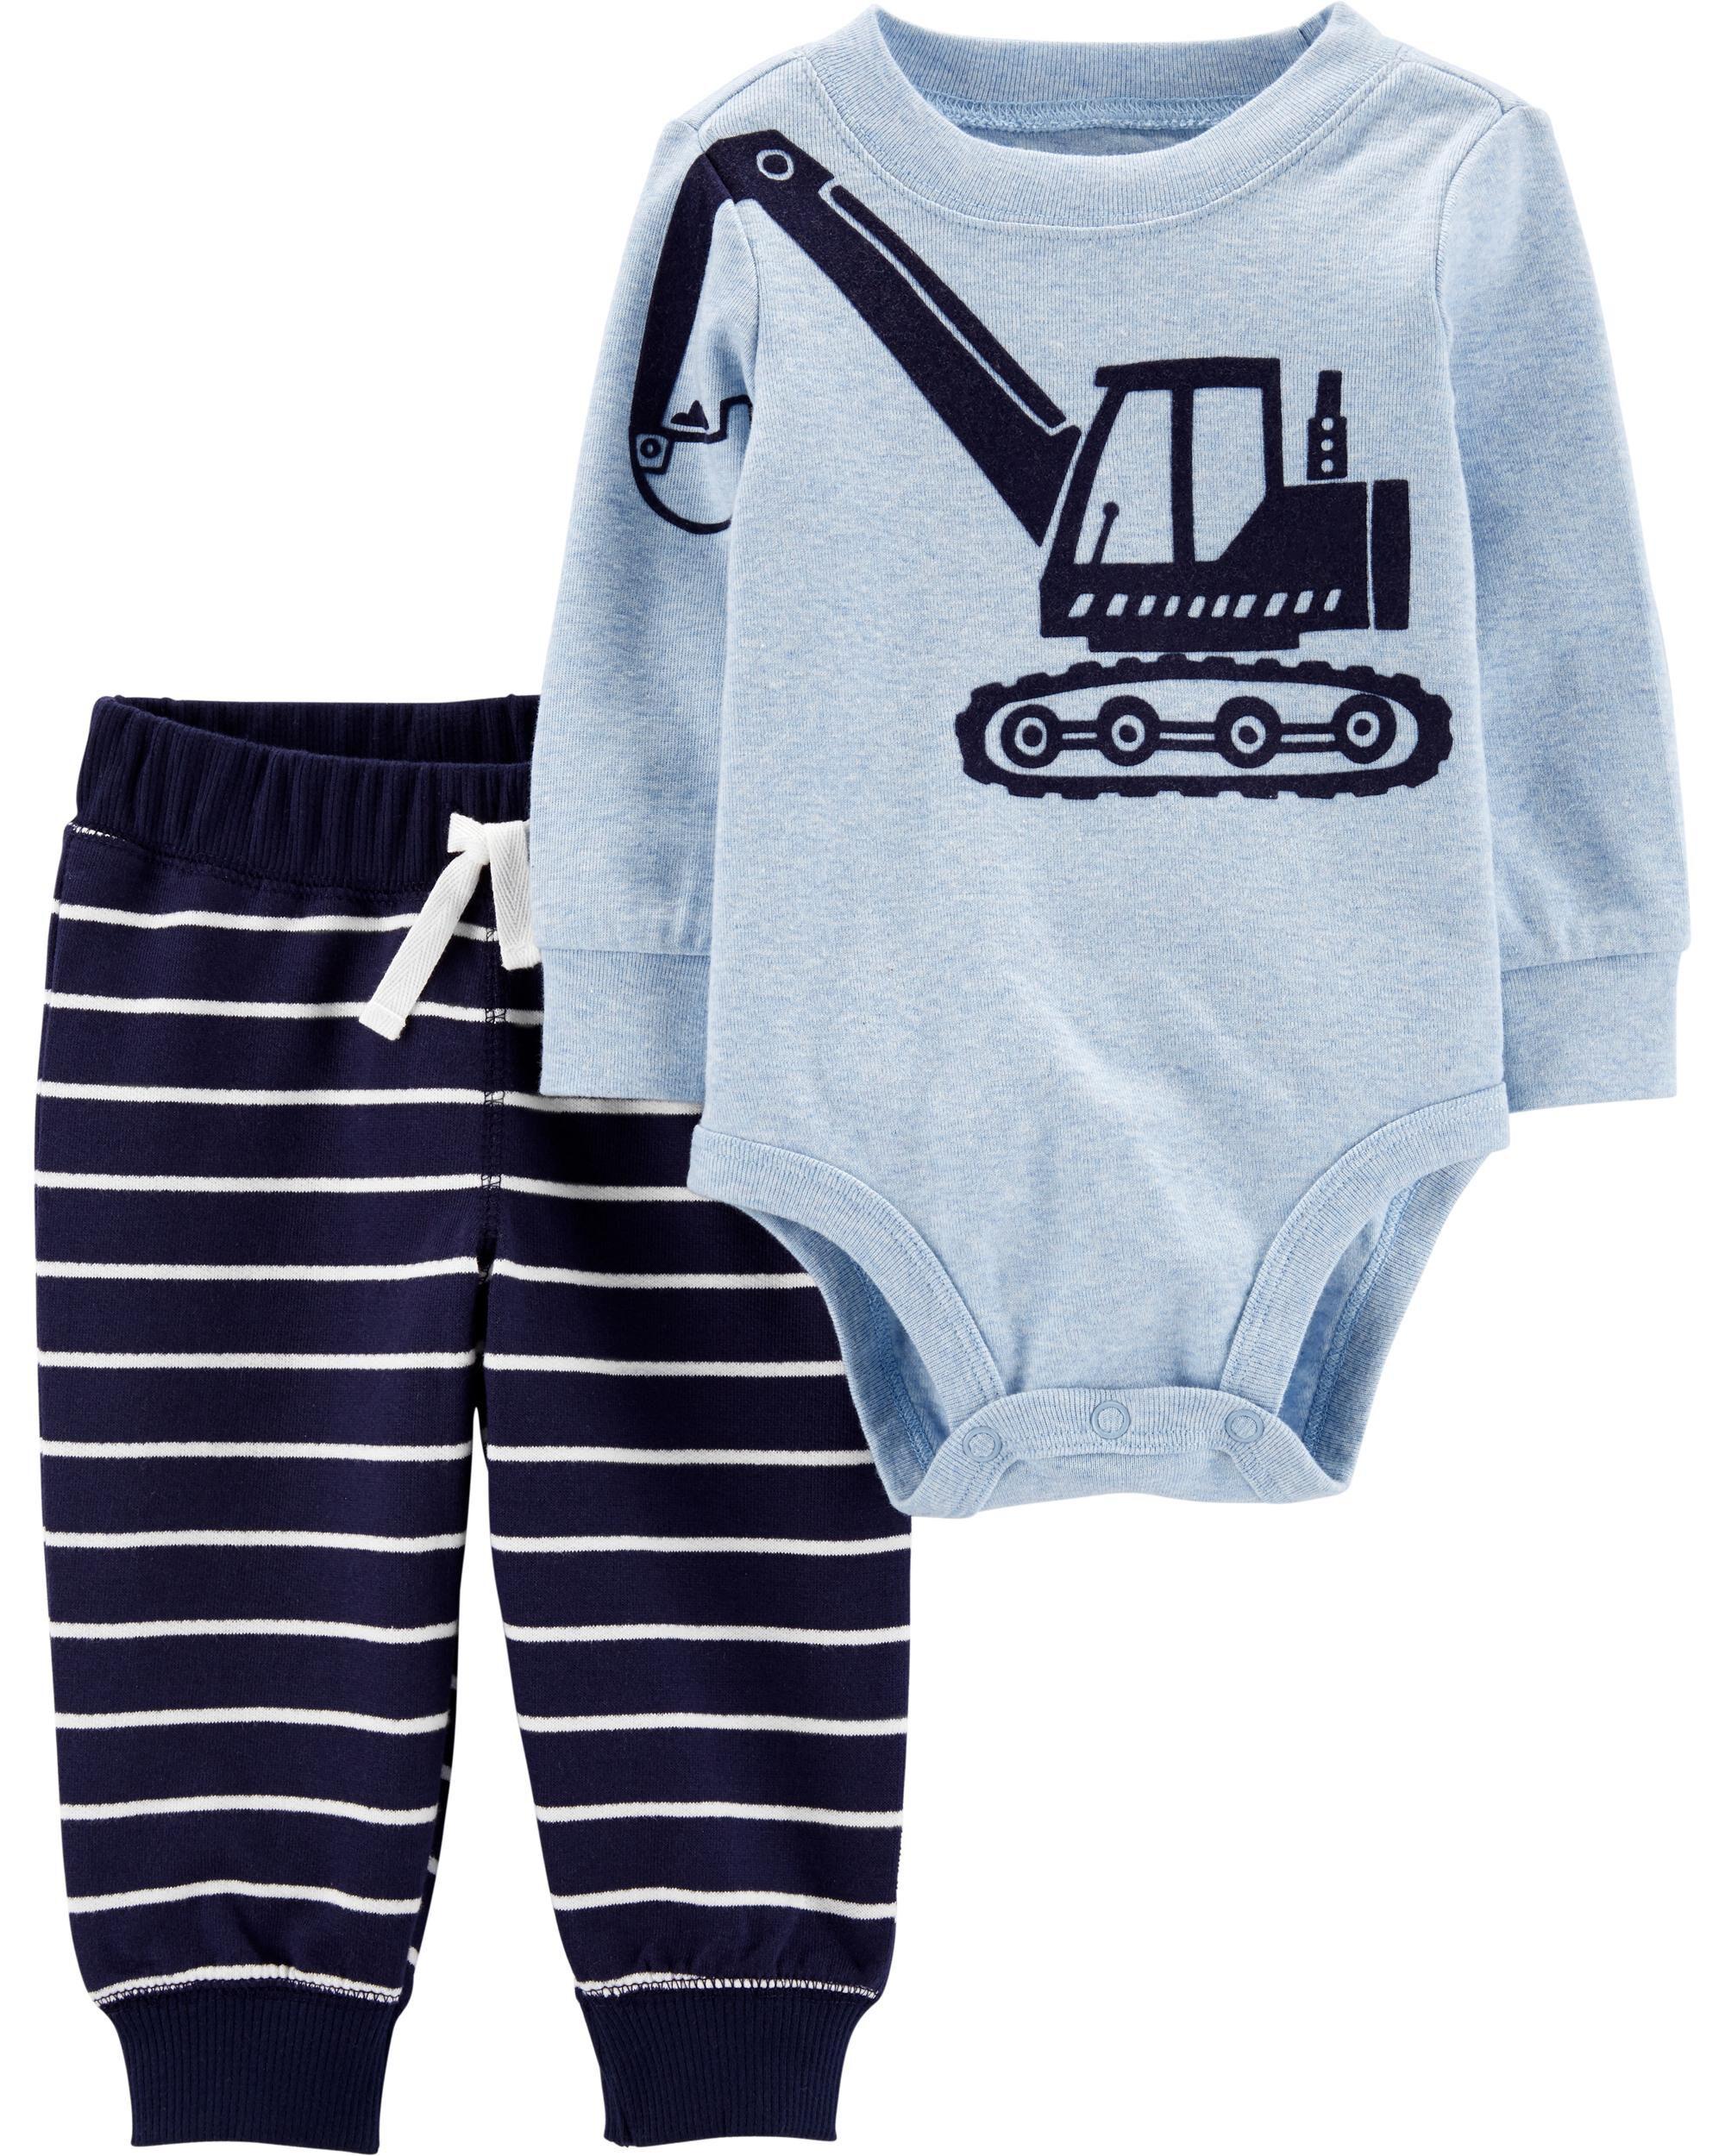 New Carter/'s Boys 2 Piece Little Brother Bodysuit Top /& Pant Set NB 3m 9m 12m